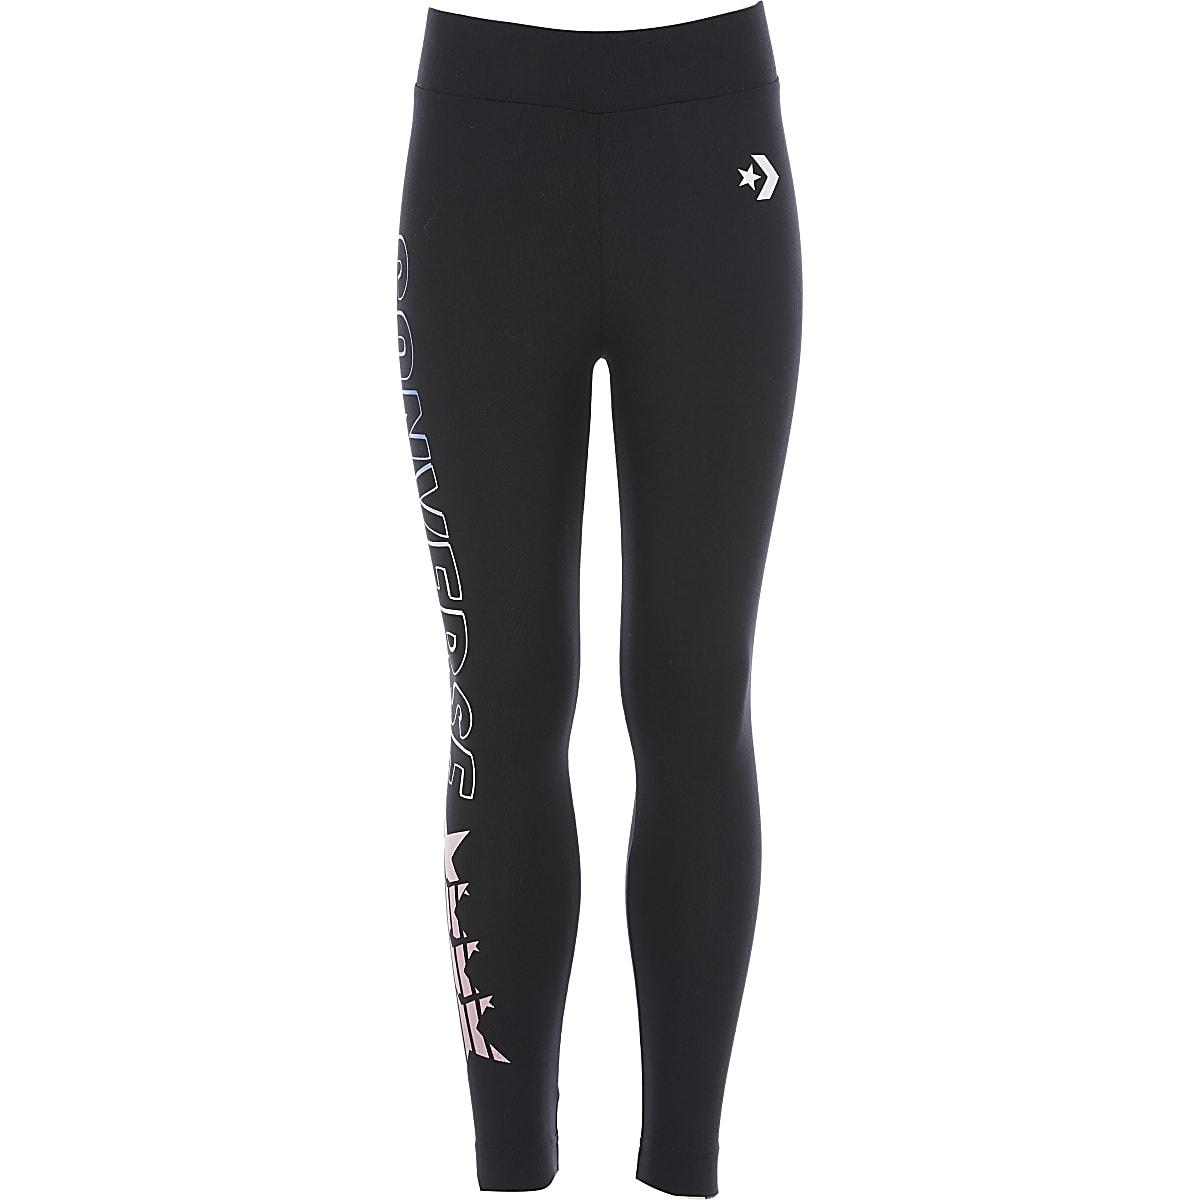 Girls Converse black leggings